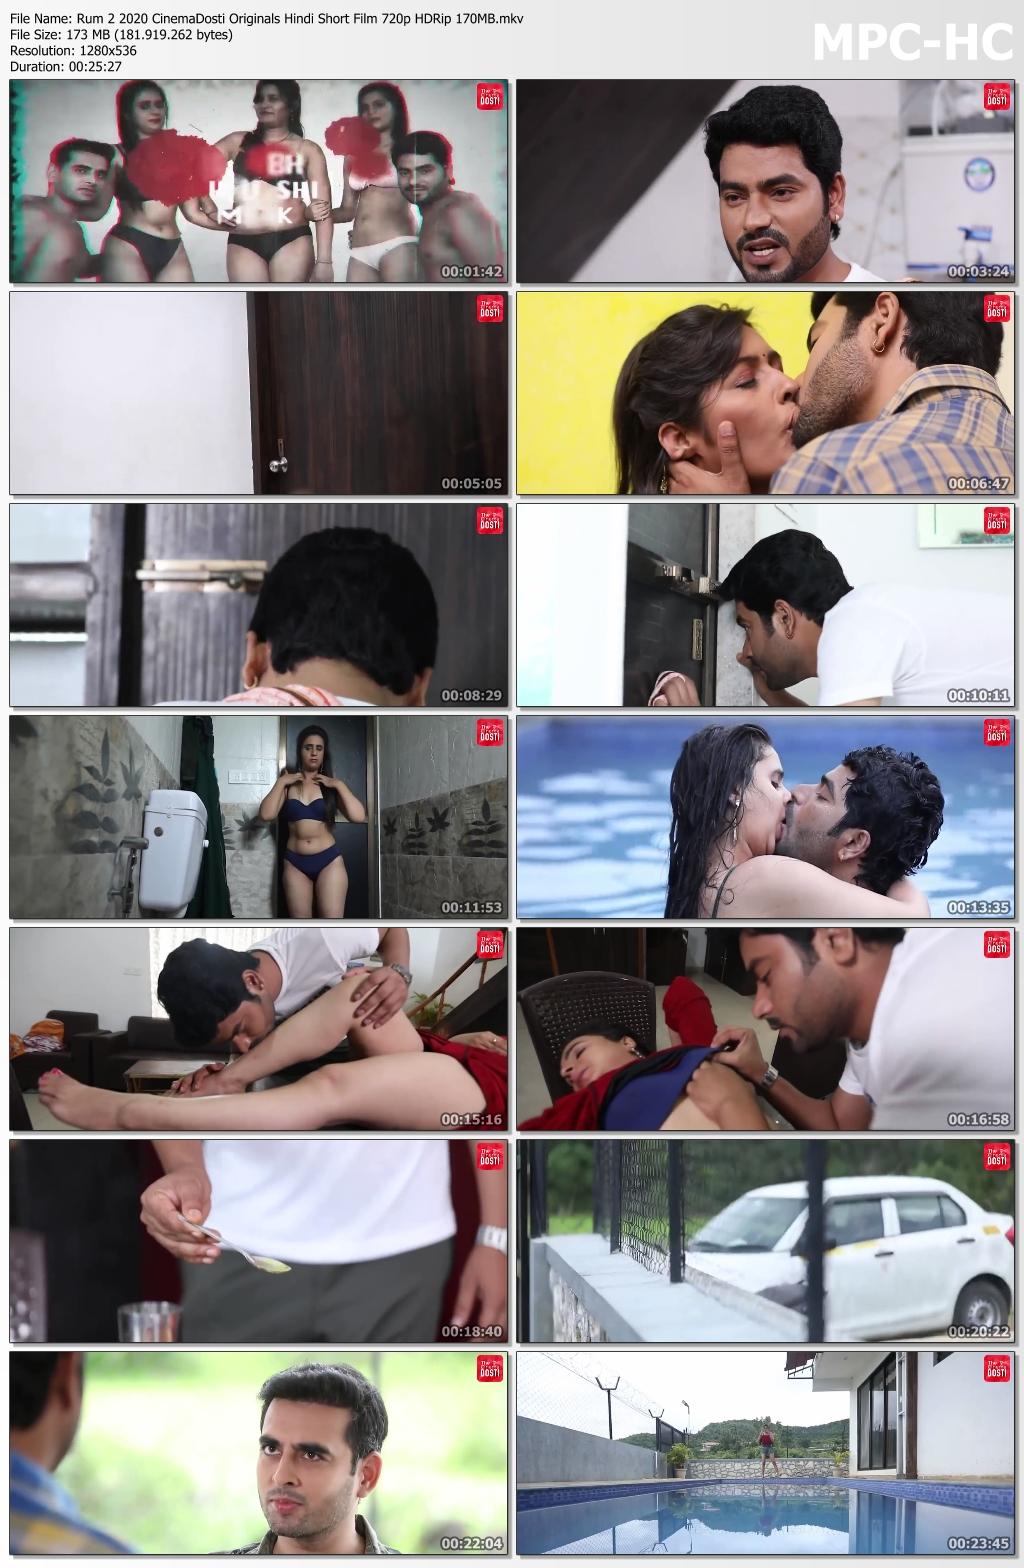 Rum-2-2020-Cinema-Dosti-Originals-Hindi-Short-Film-720p-HDRip-170-MB-mkv-thumbs